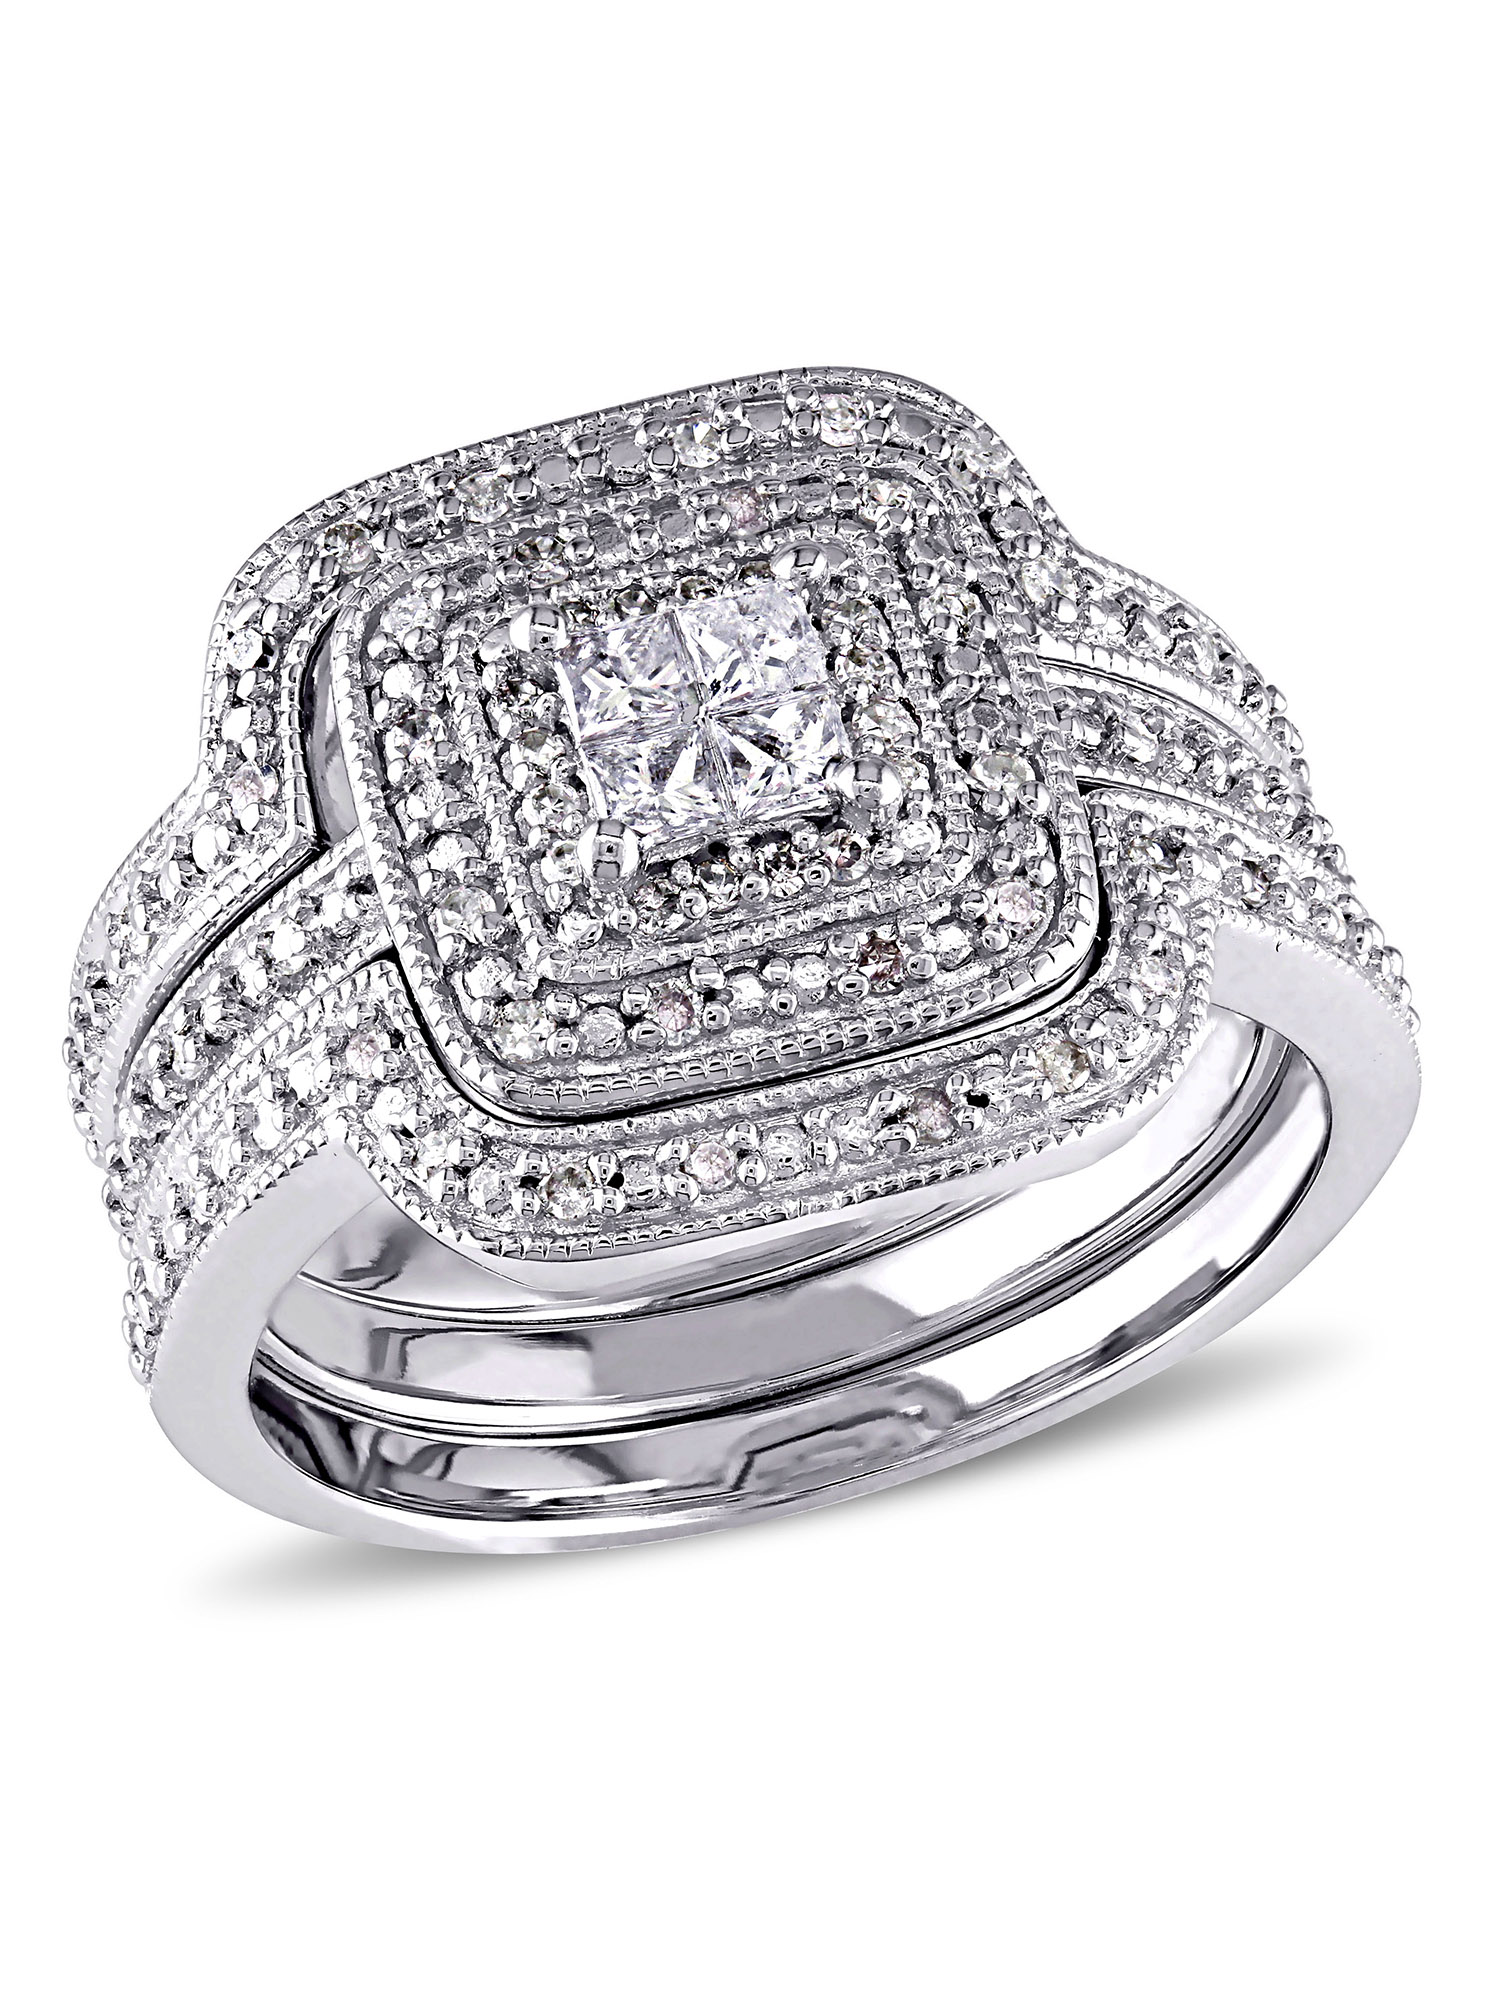 Miabella 3 8 Carat T.W. Princess and Round-Cut Diamond Sterling Silver Bridal Set by Miabella